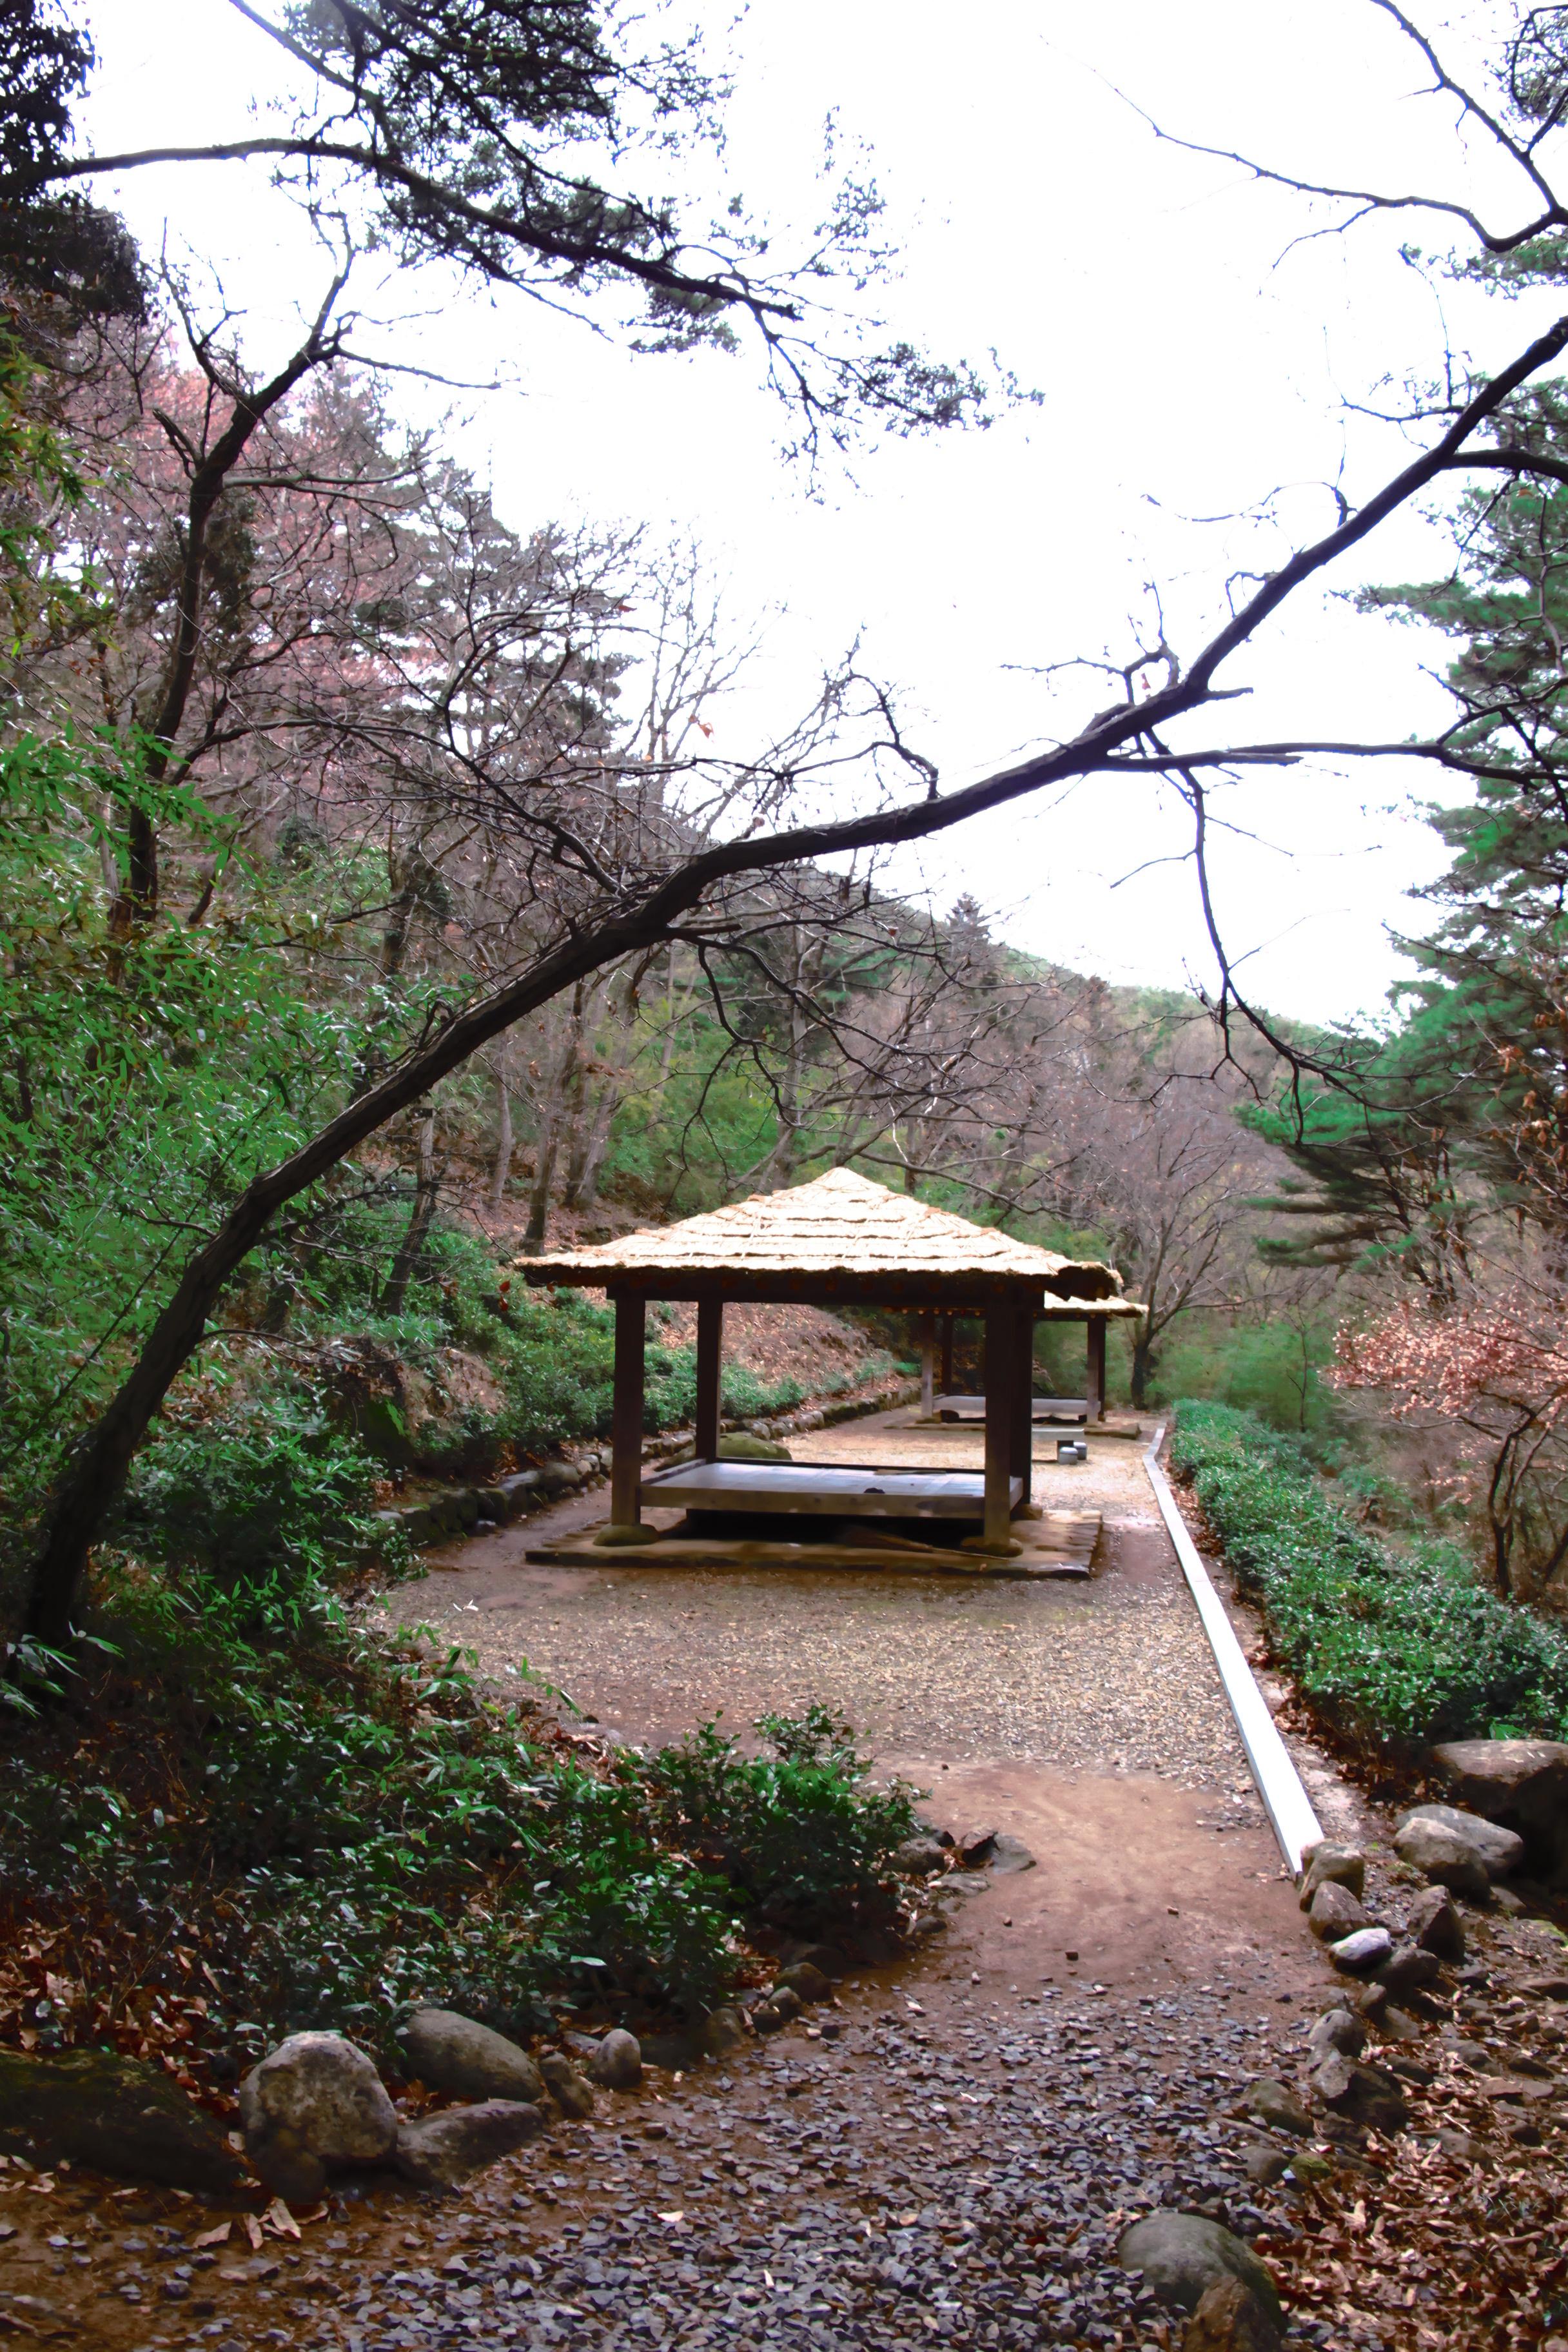 KOREA – NATIONAL PARKS, FORESTS, HIKING & CAMPING